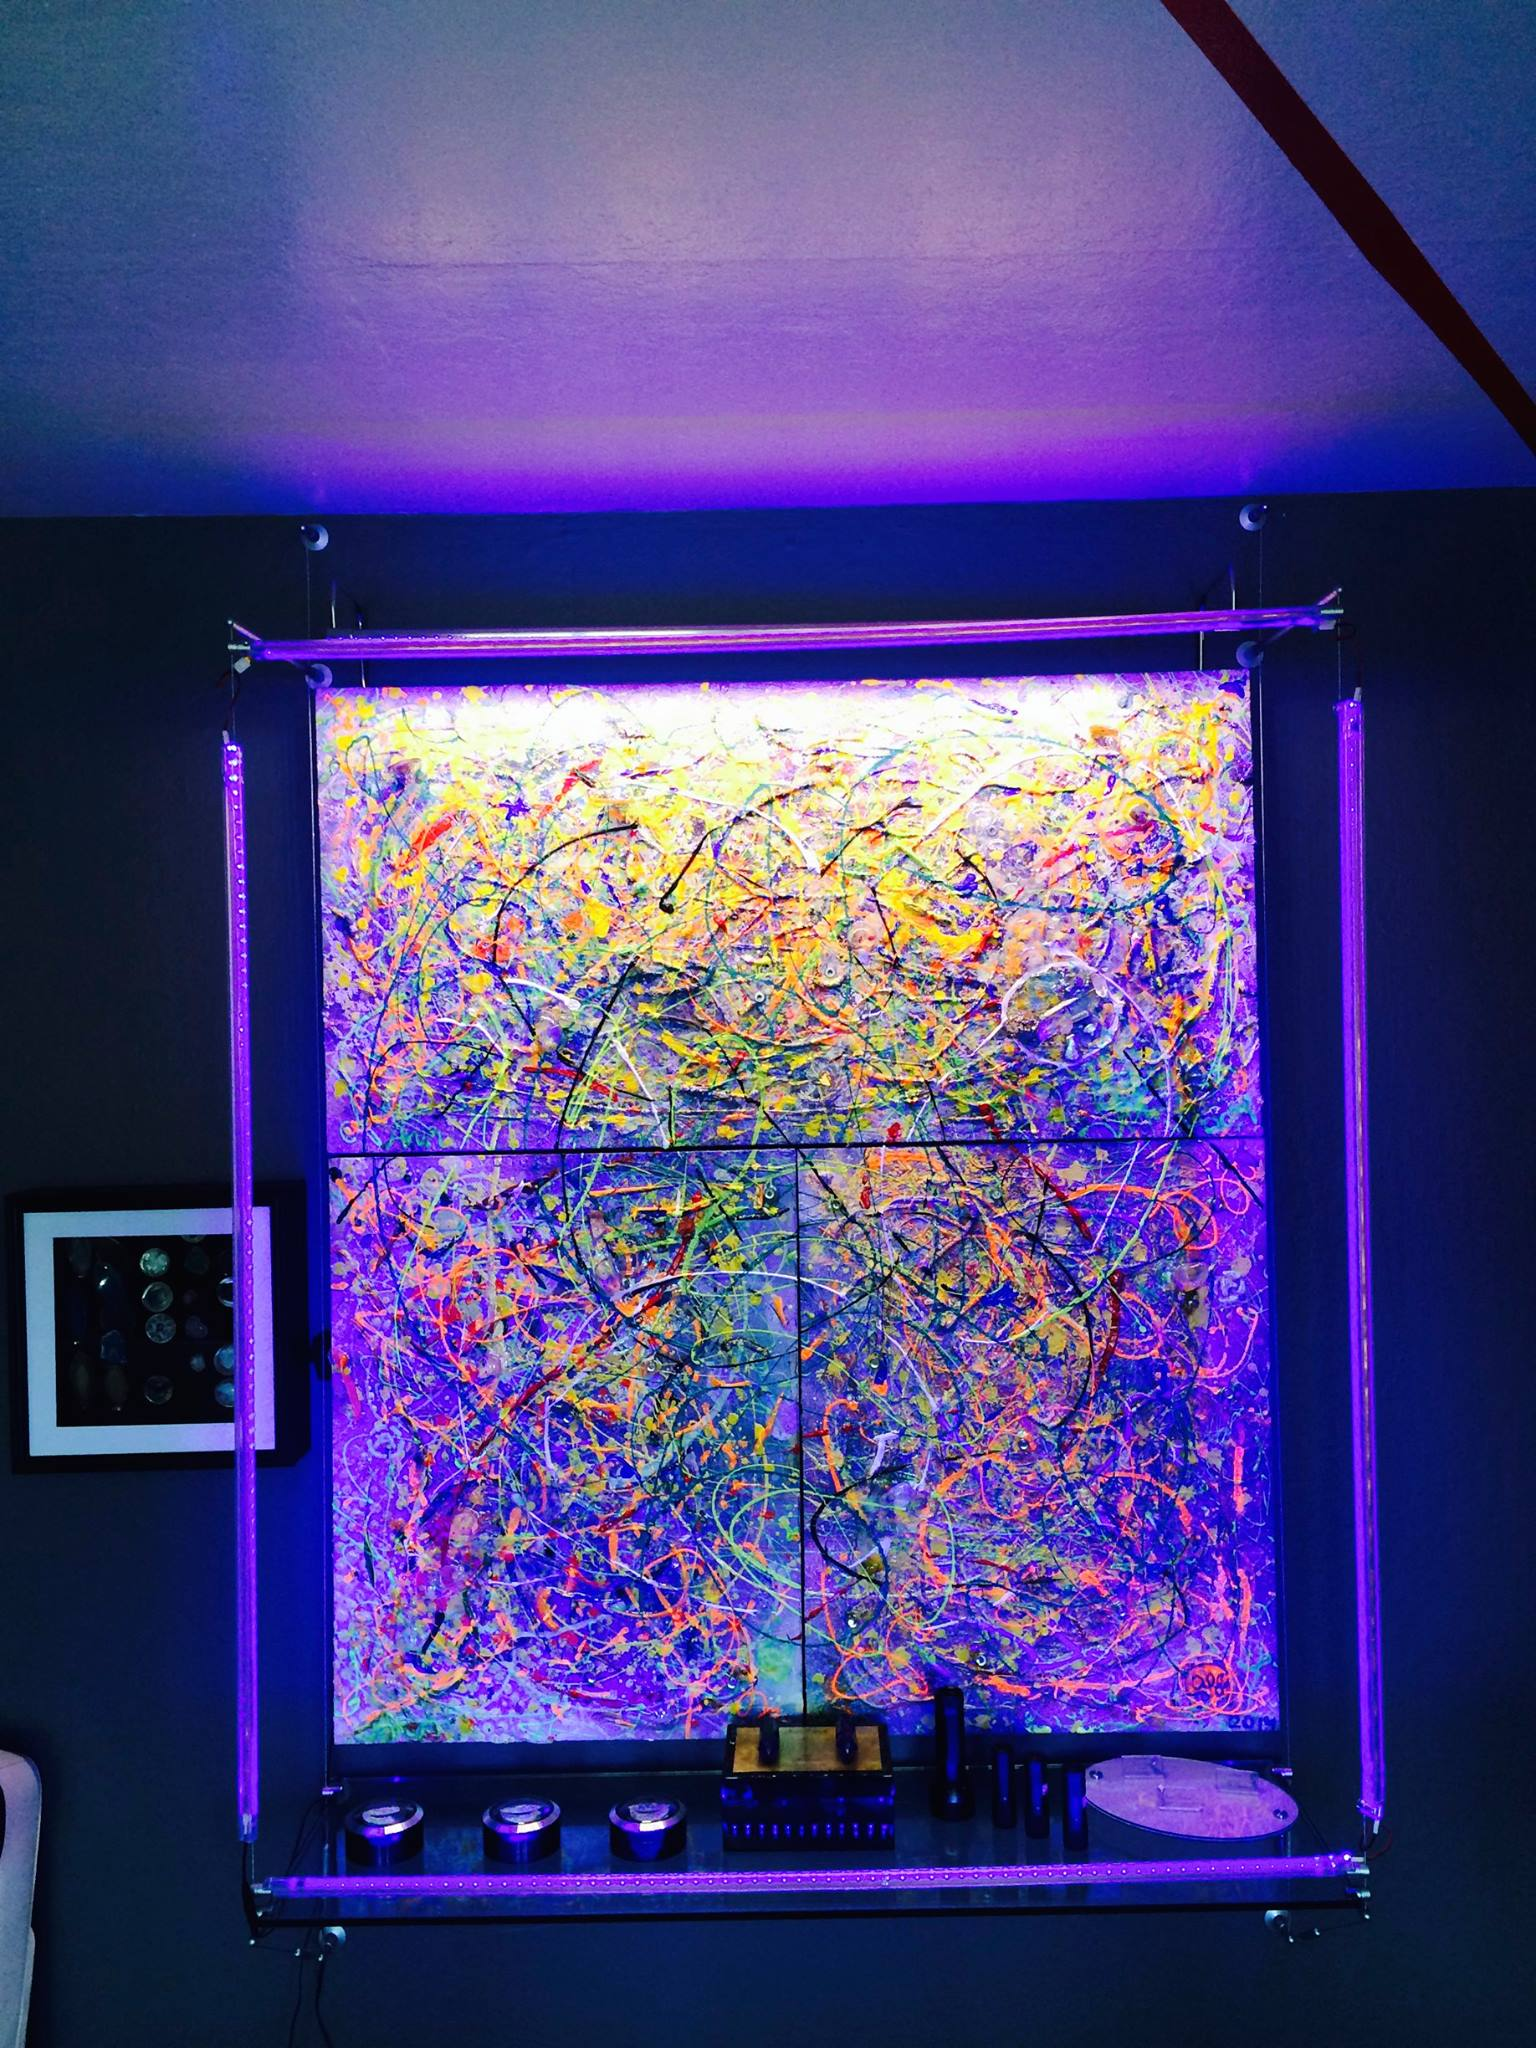 Day/Night - Interactive - changable - social - home entertainment art